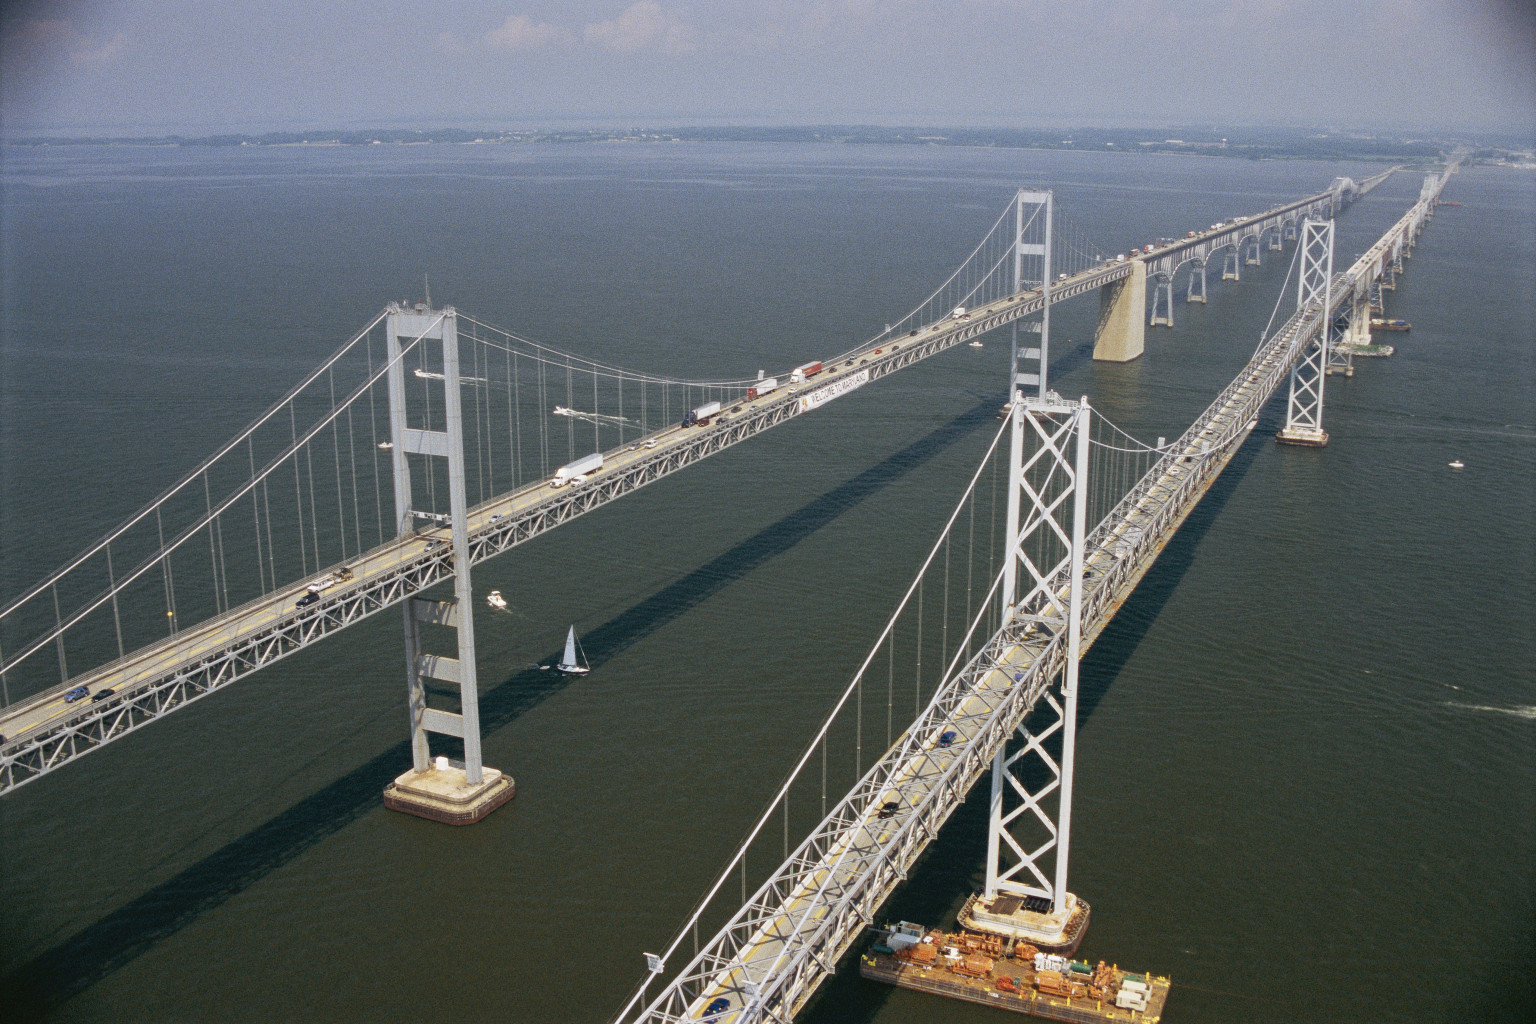 Full size image: The Chesapeake Bay Bridge